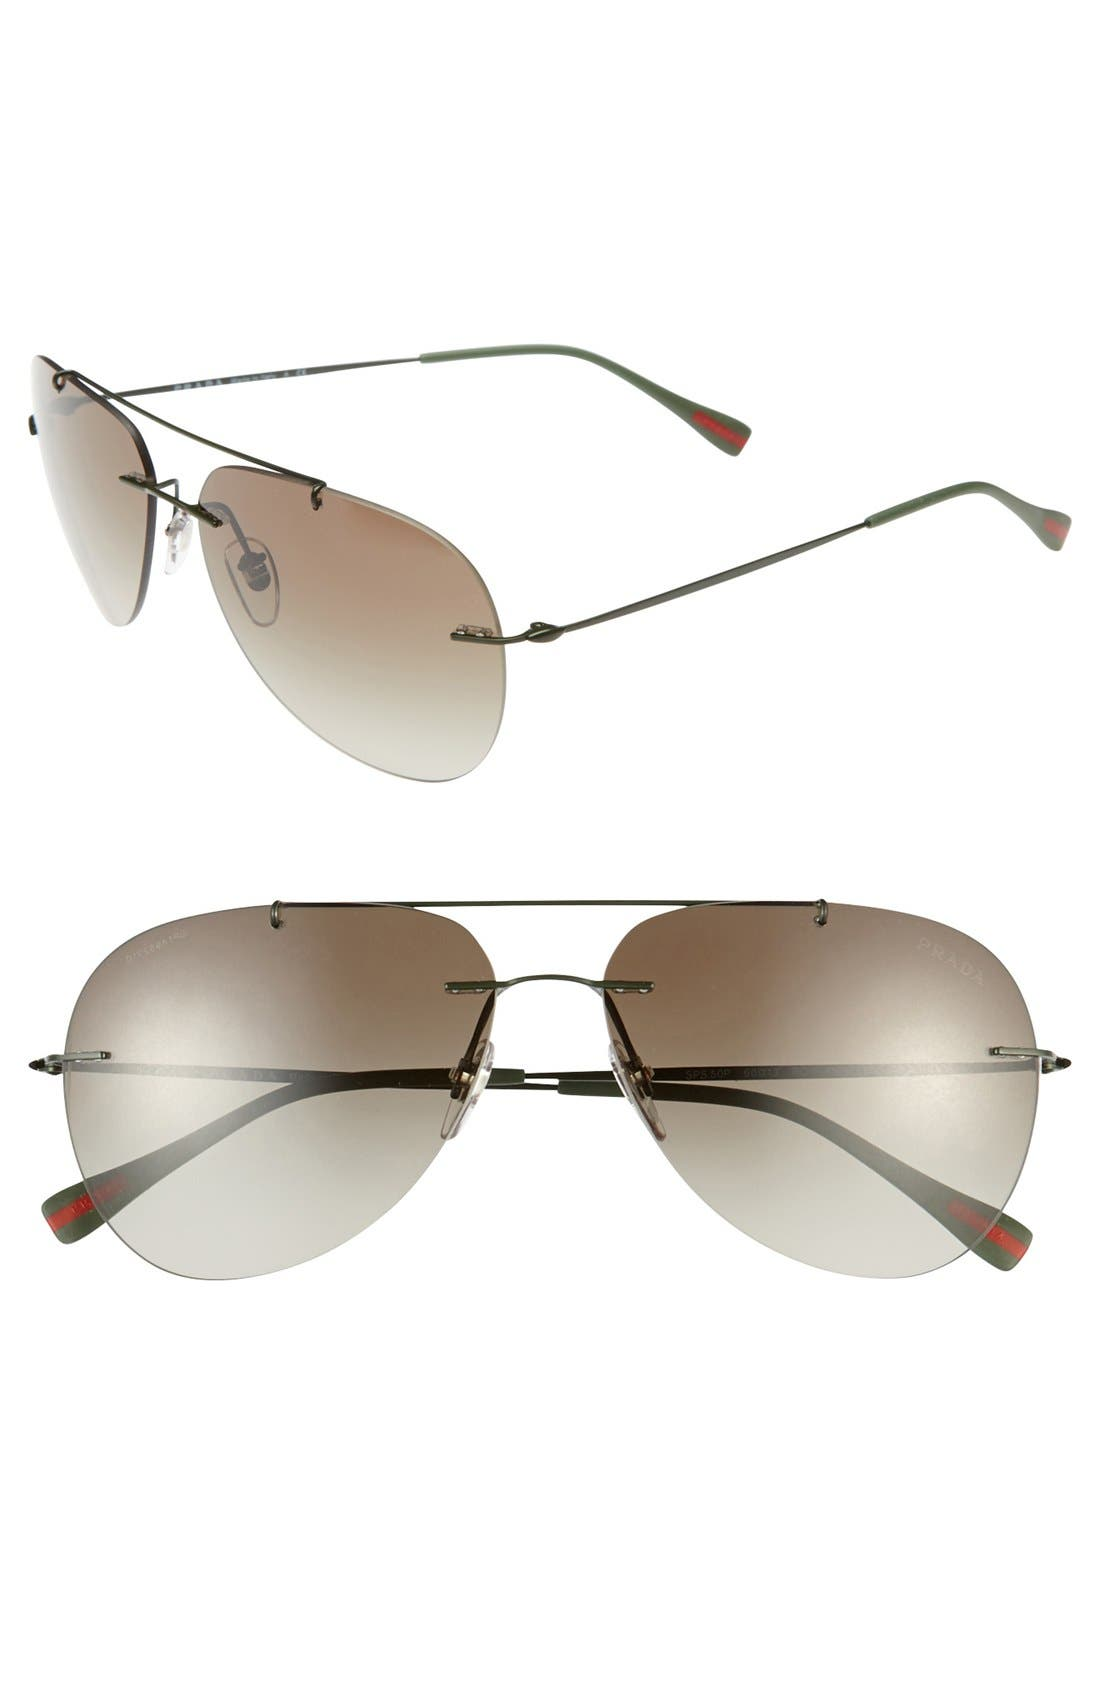 Main Image - Prada 'Pilot' 60mm Rimless Sunglasses